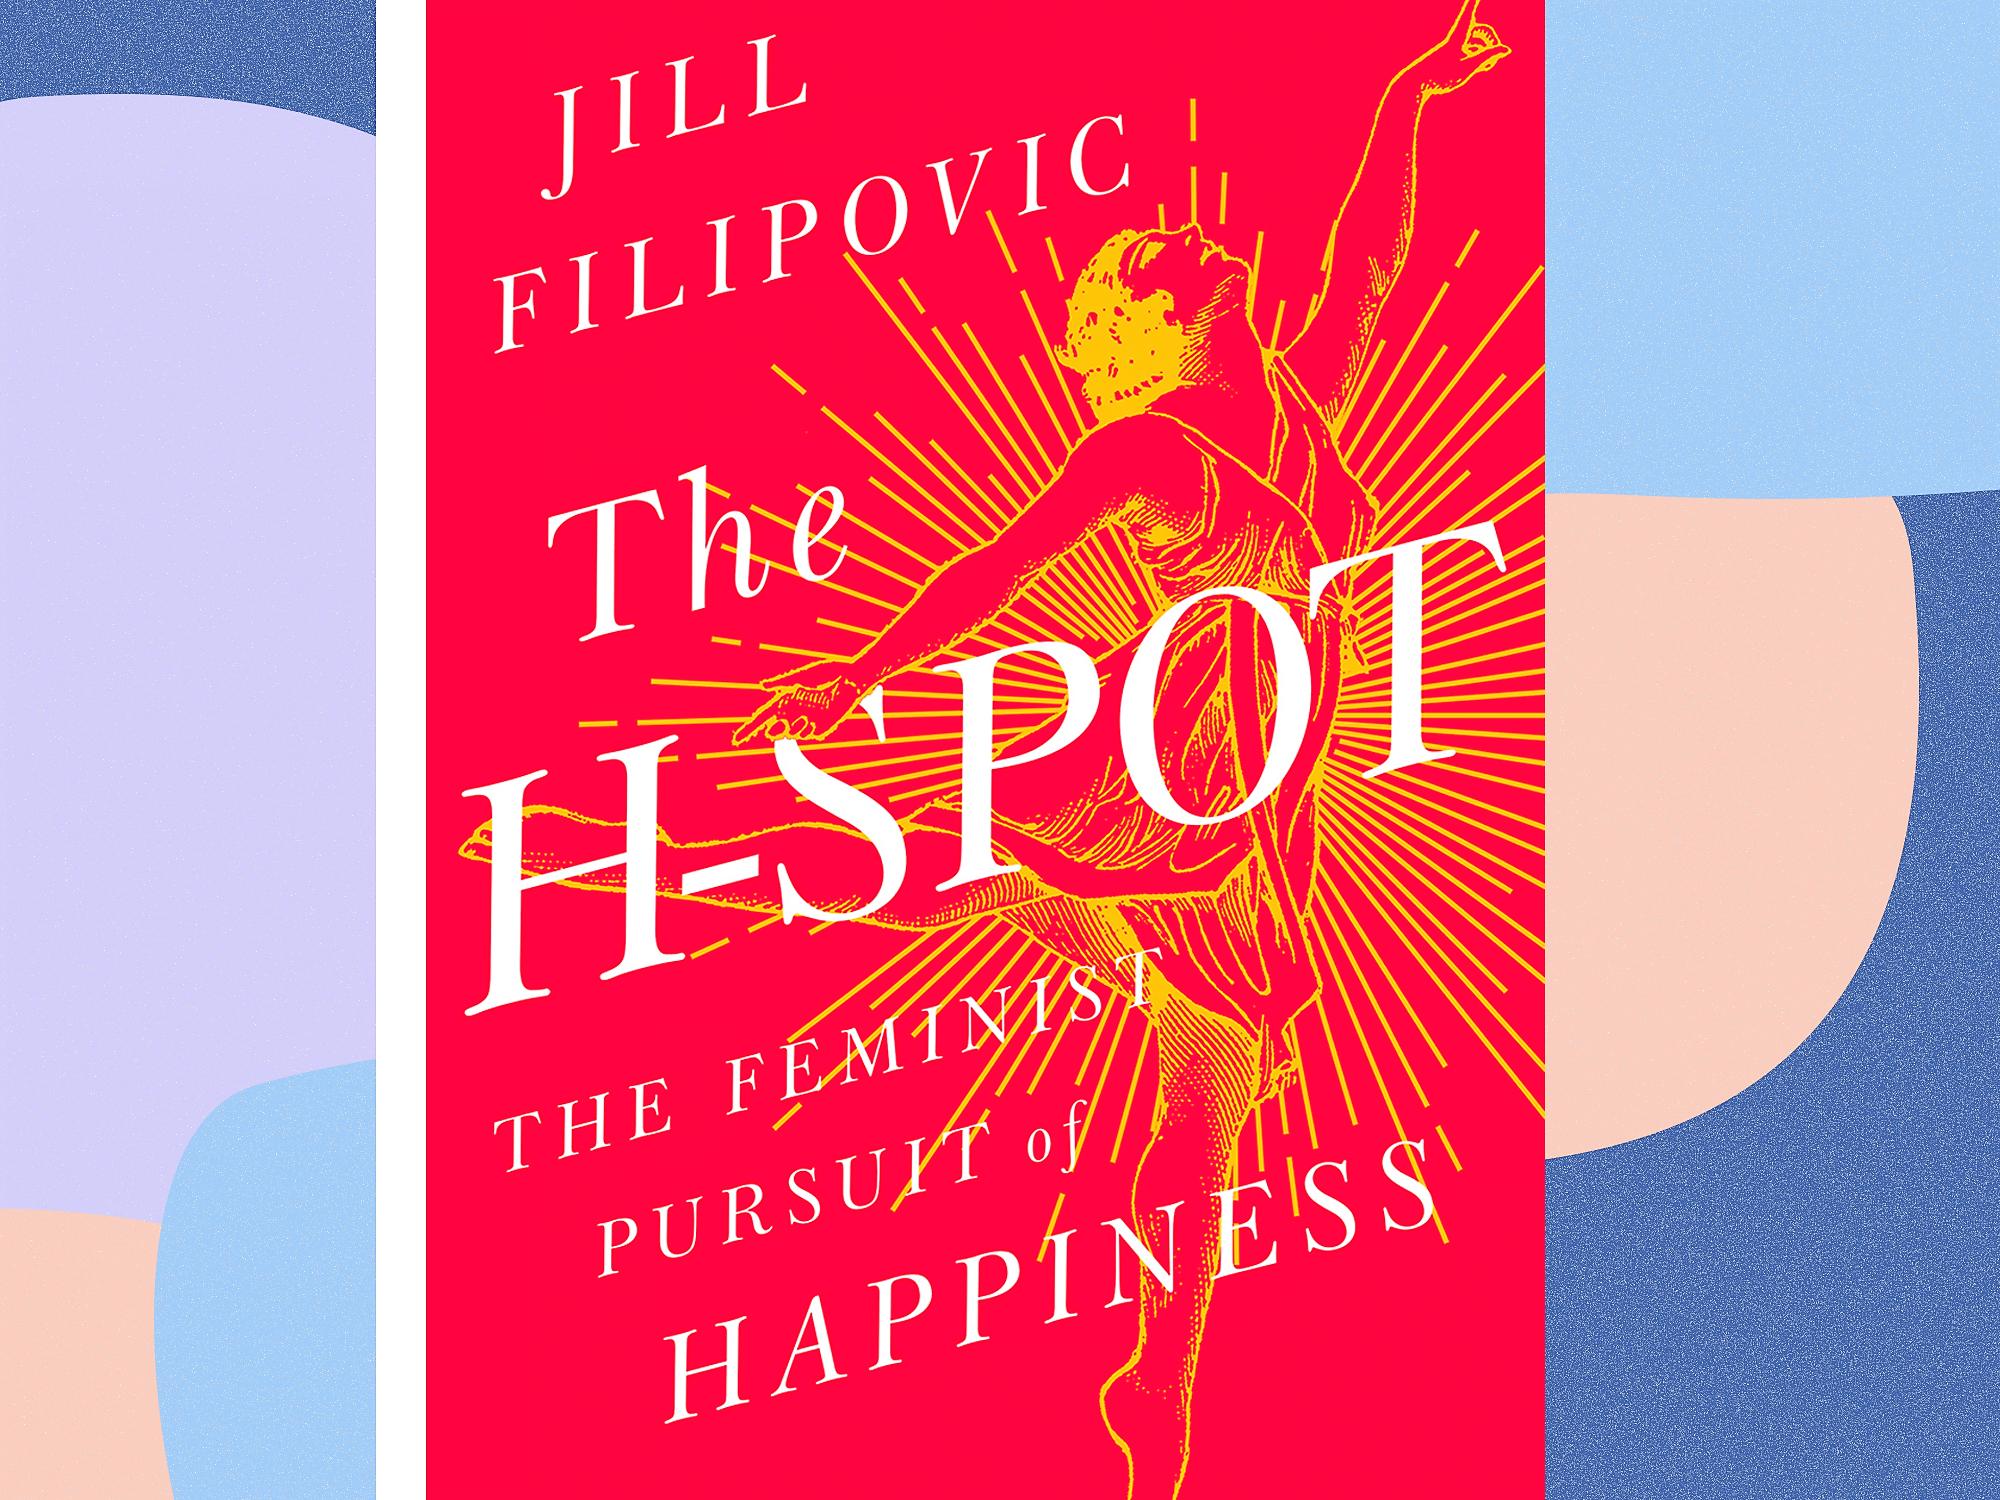 Filipovic Jill The H Spot The Feminist Pursuit Of